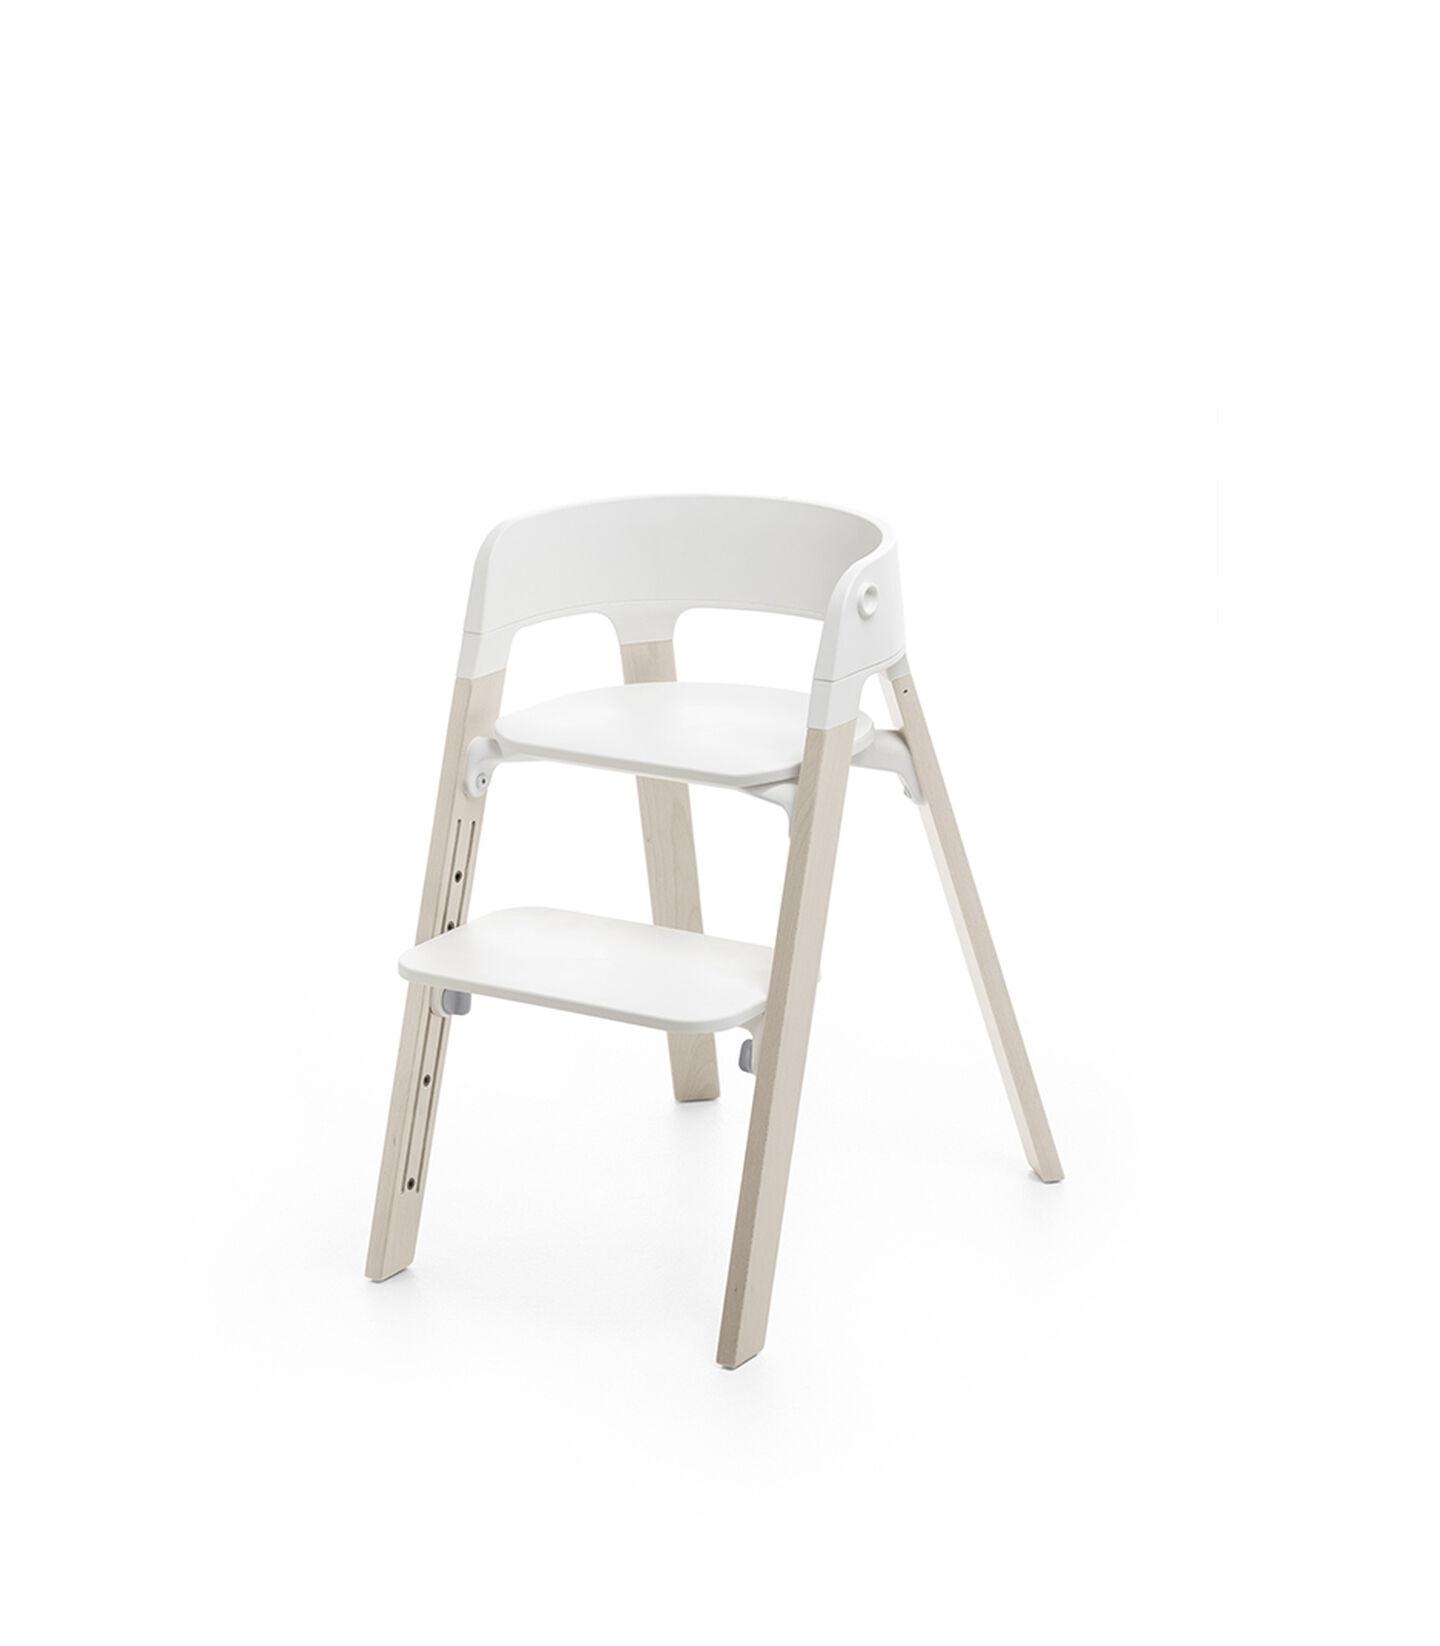 Stokke® Steps™ Chair Whitewash Legs with White, Whitewash, mainview view 2